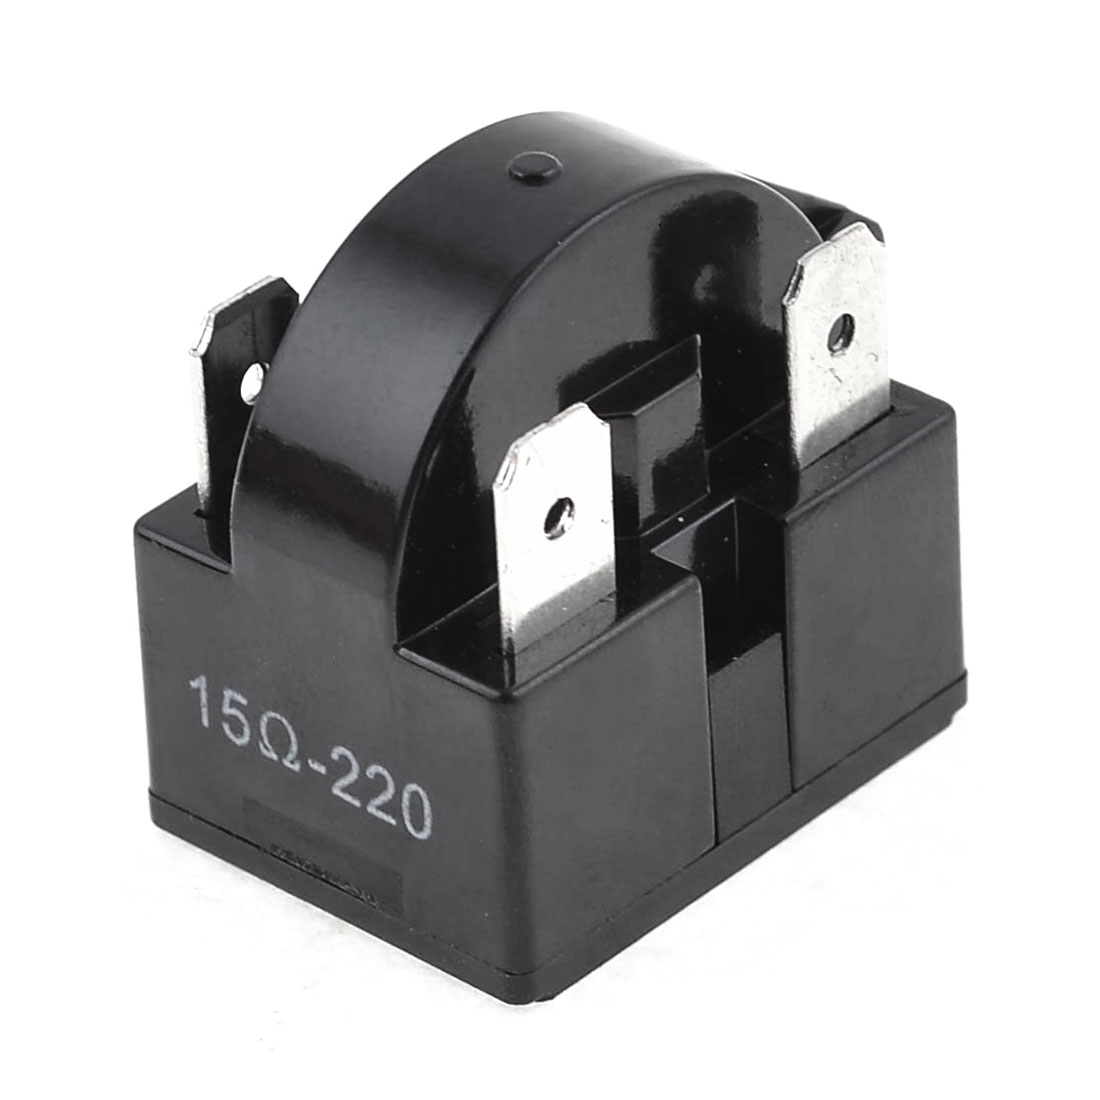 Black Plastic Housing 15 Ohm 4 Pins Refrigerator PTC Starter Relay